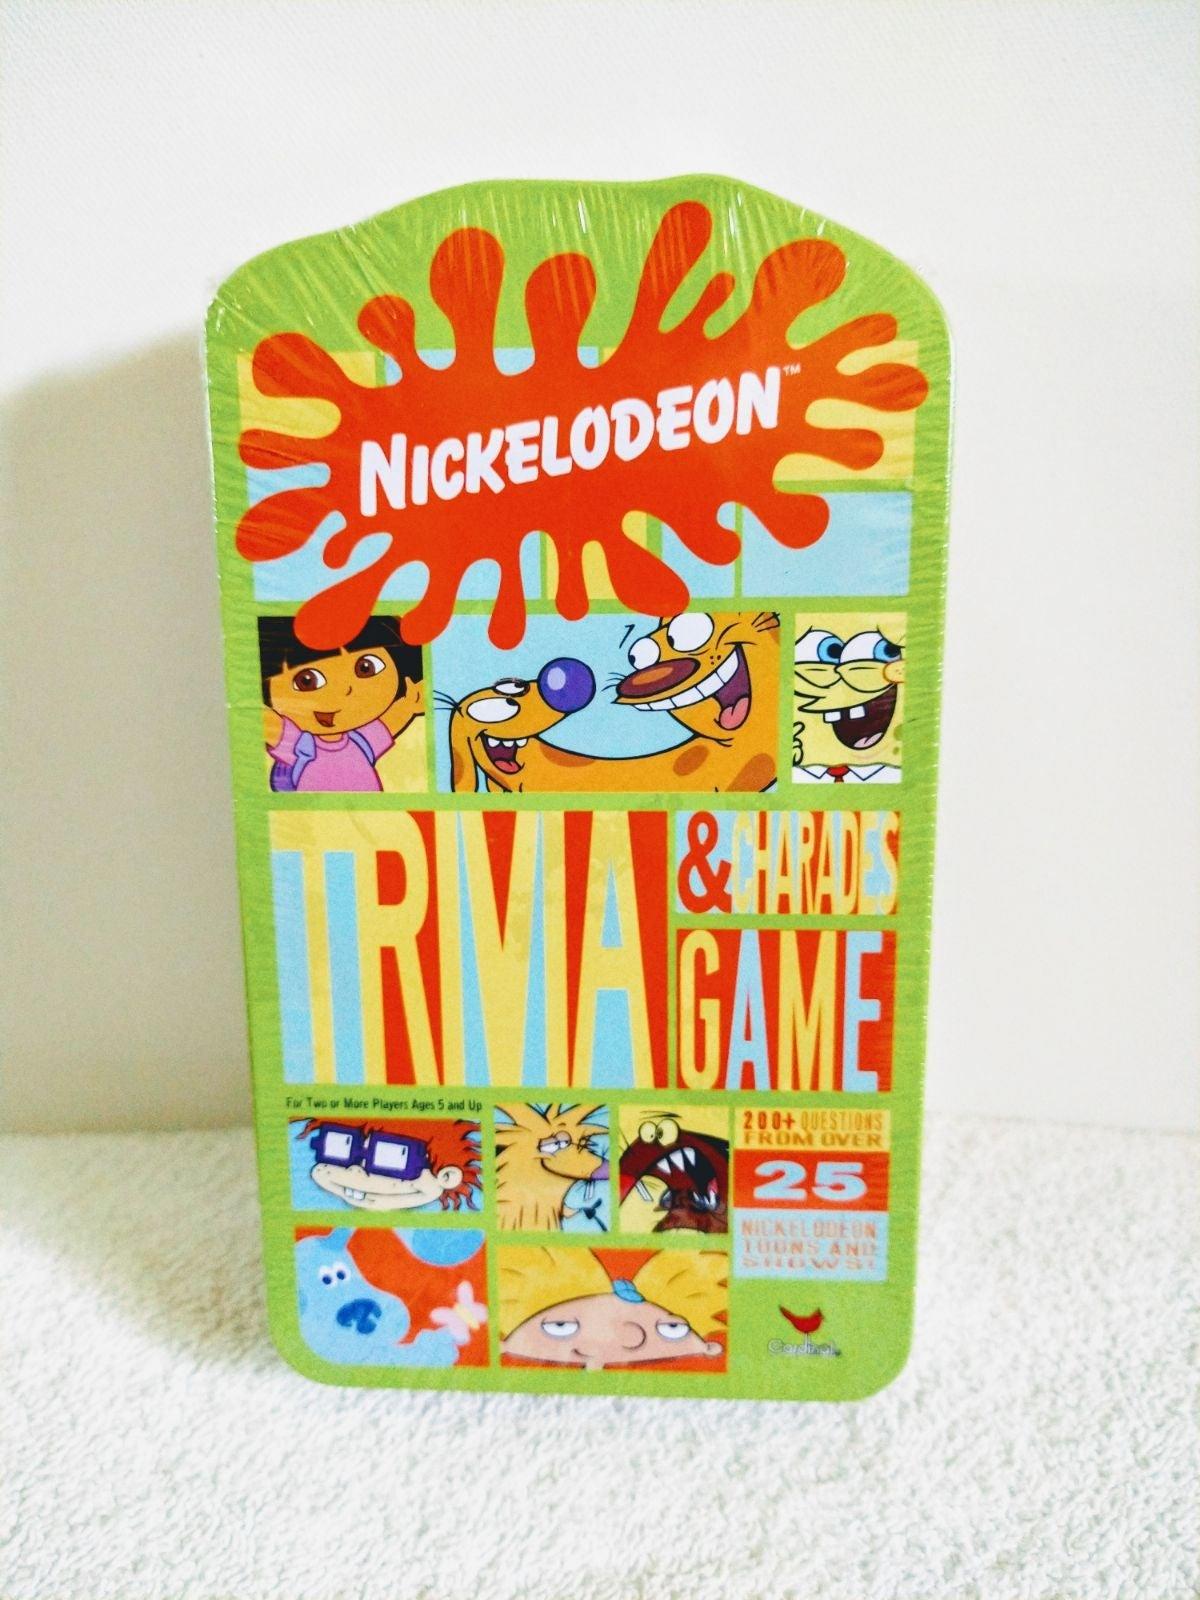 Nickelodeon 'Trivia & Charades' Game